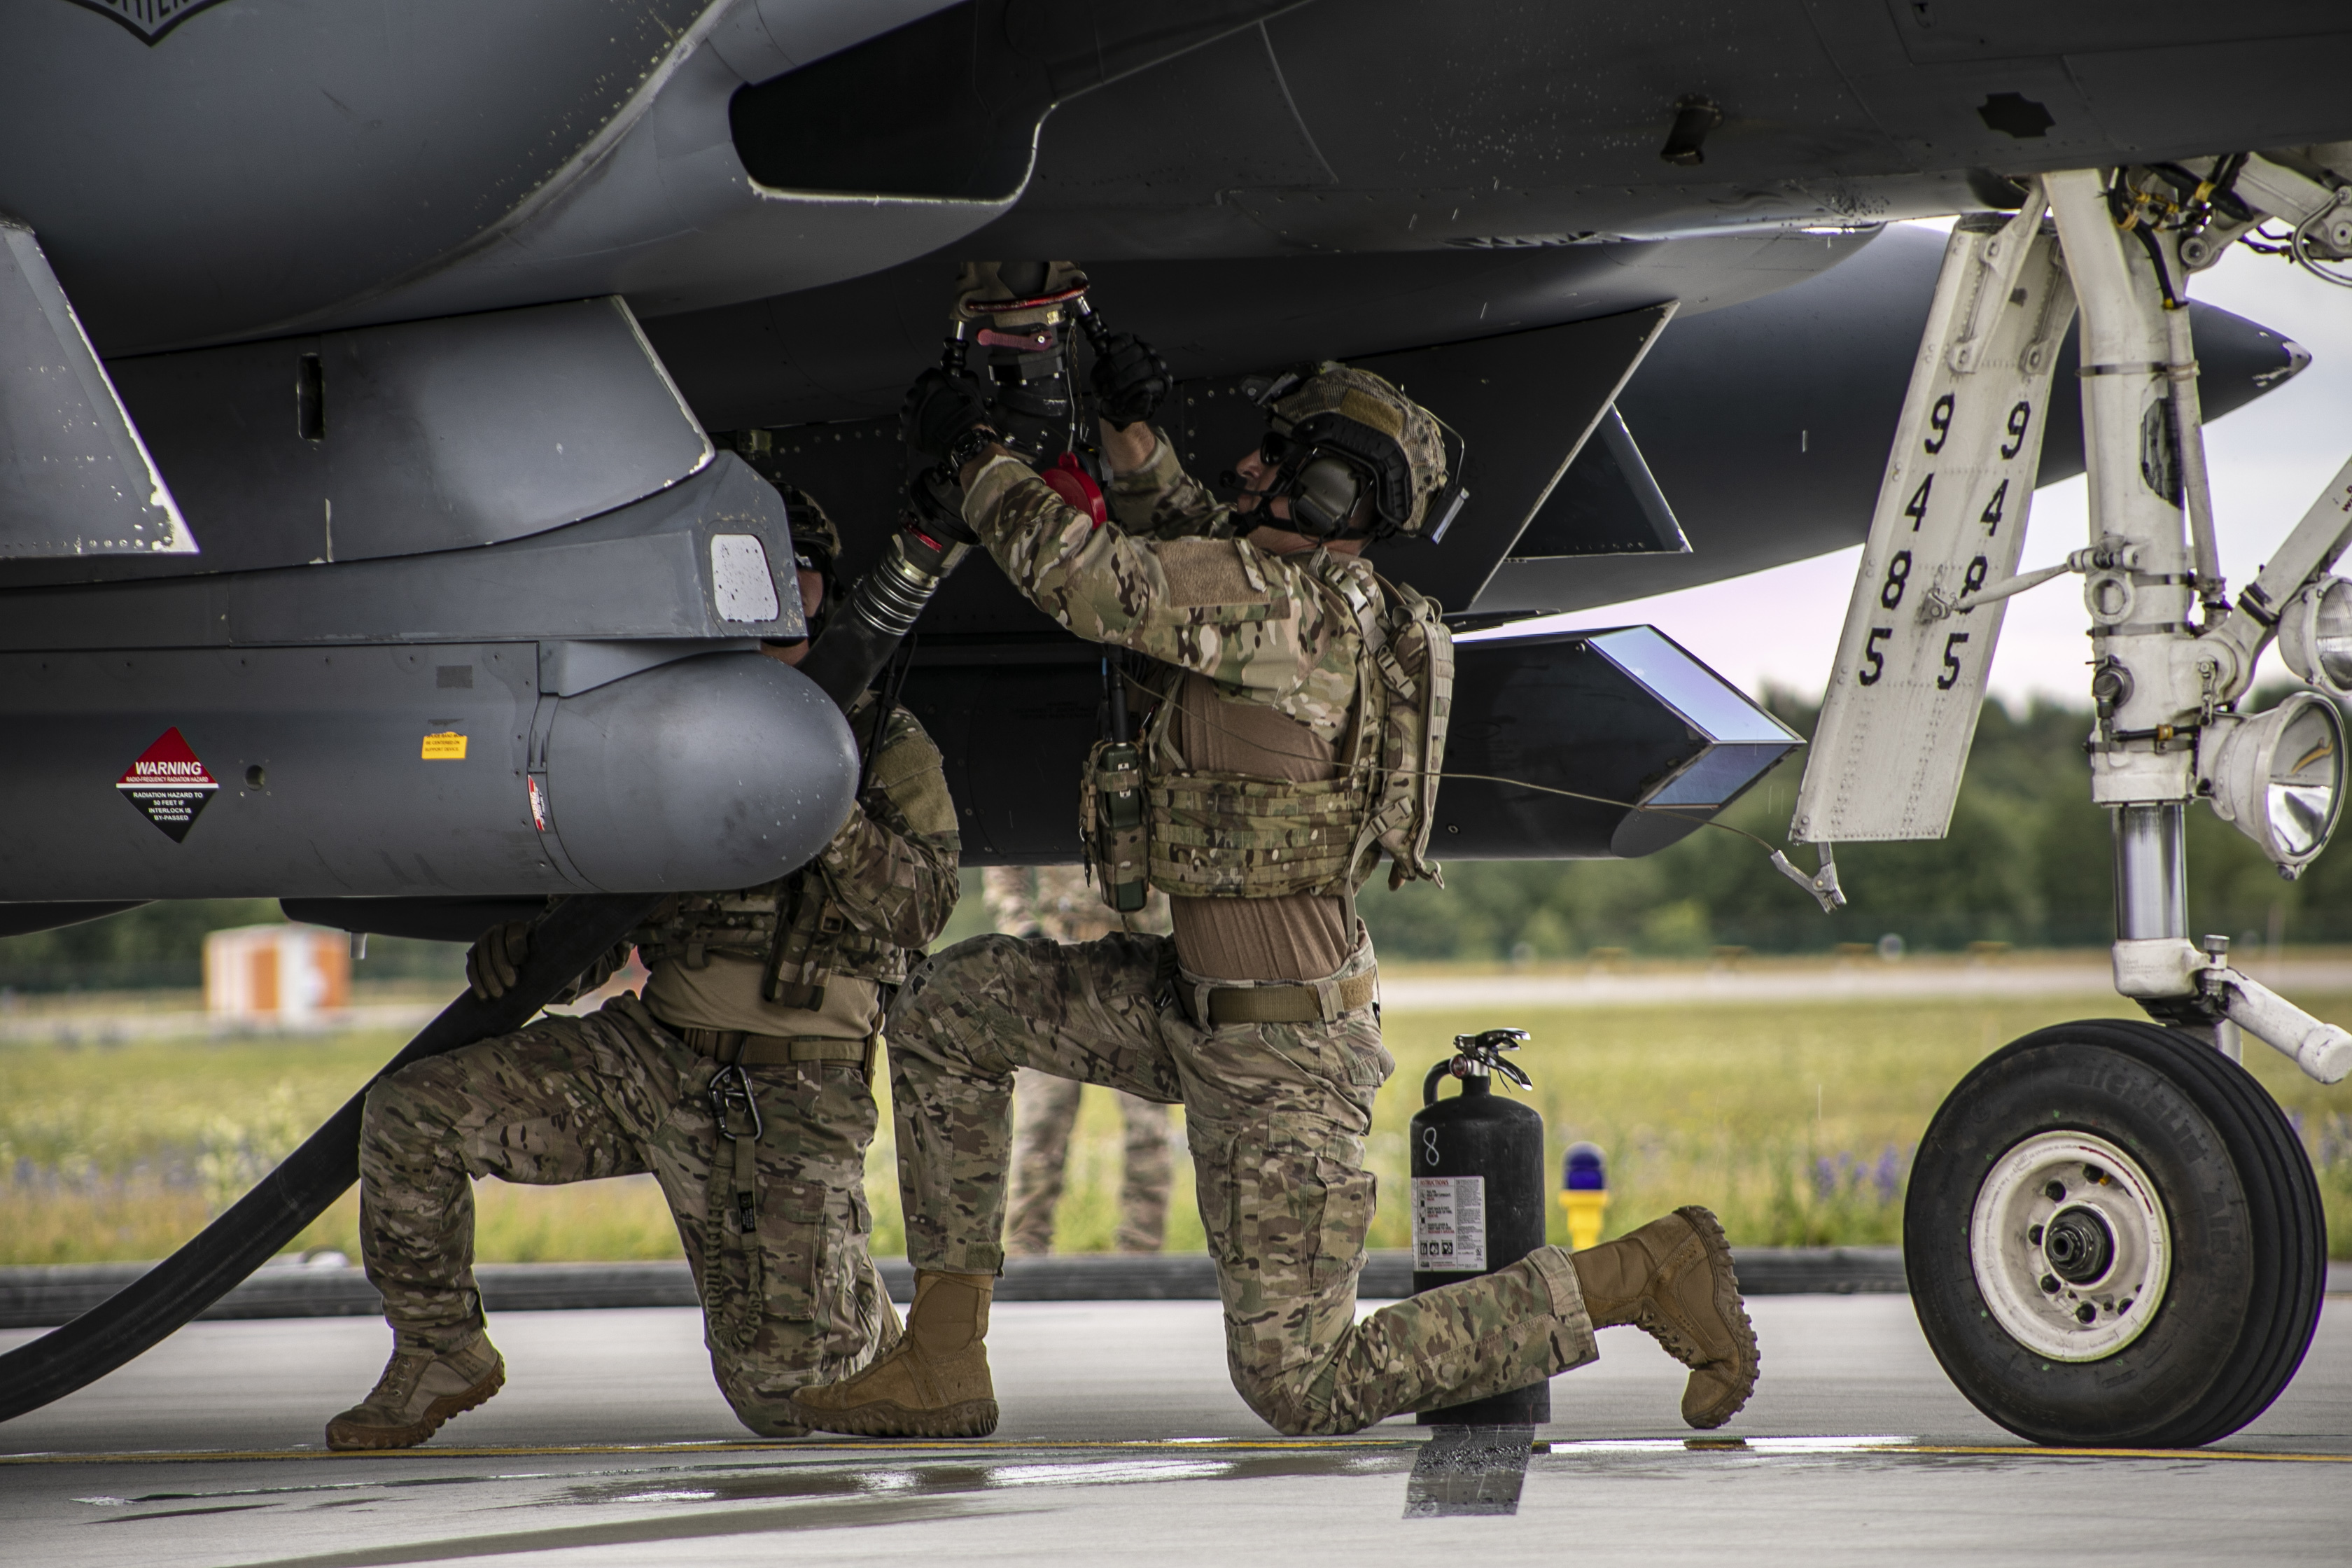 Two U.S. Air Force logistics readiness airmen attach a fuel nozzle underneath an F-15E Strike Eagle during a forward air refueling point mission on July 16, 2019, at Amari Air Base, Estonia. (Sgt. Alexis Washburn-Jasinski/U.S. Army)